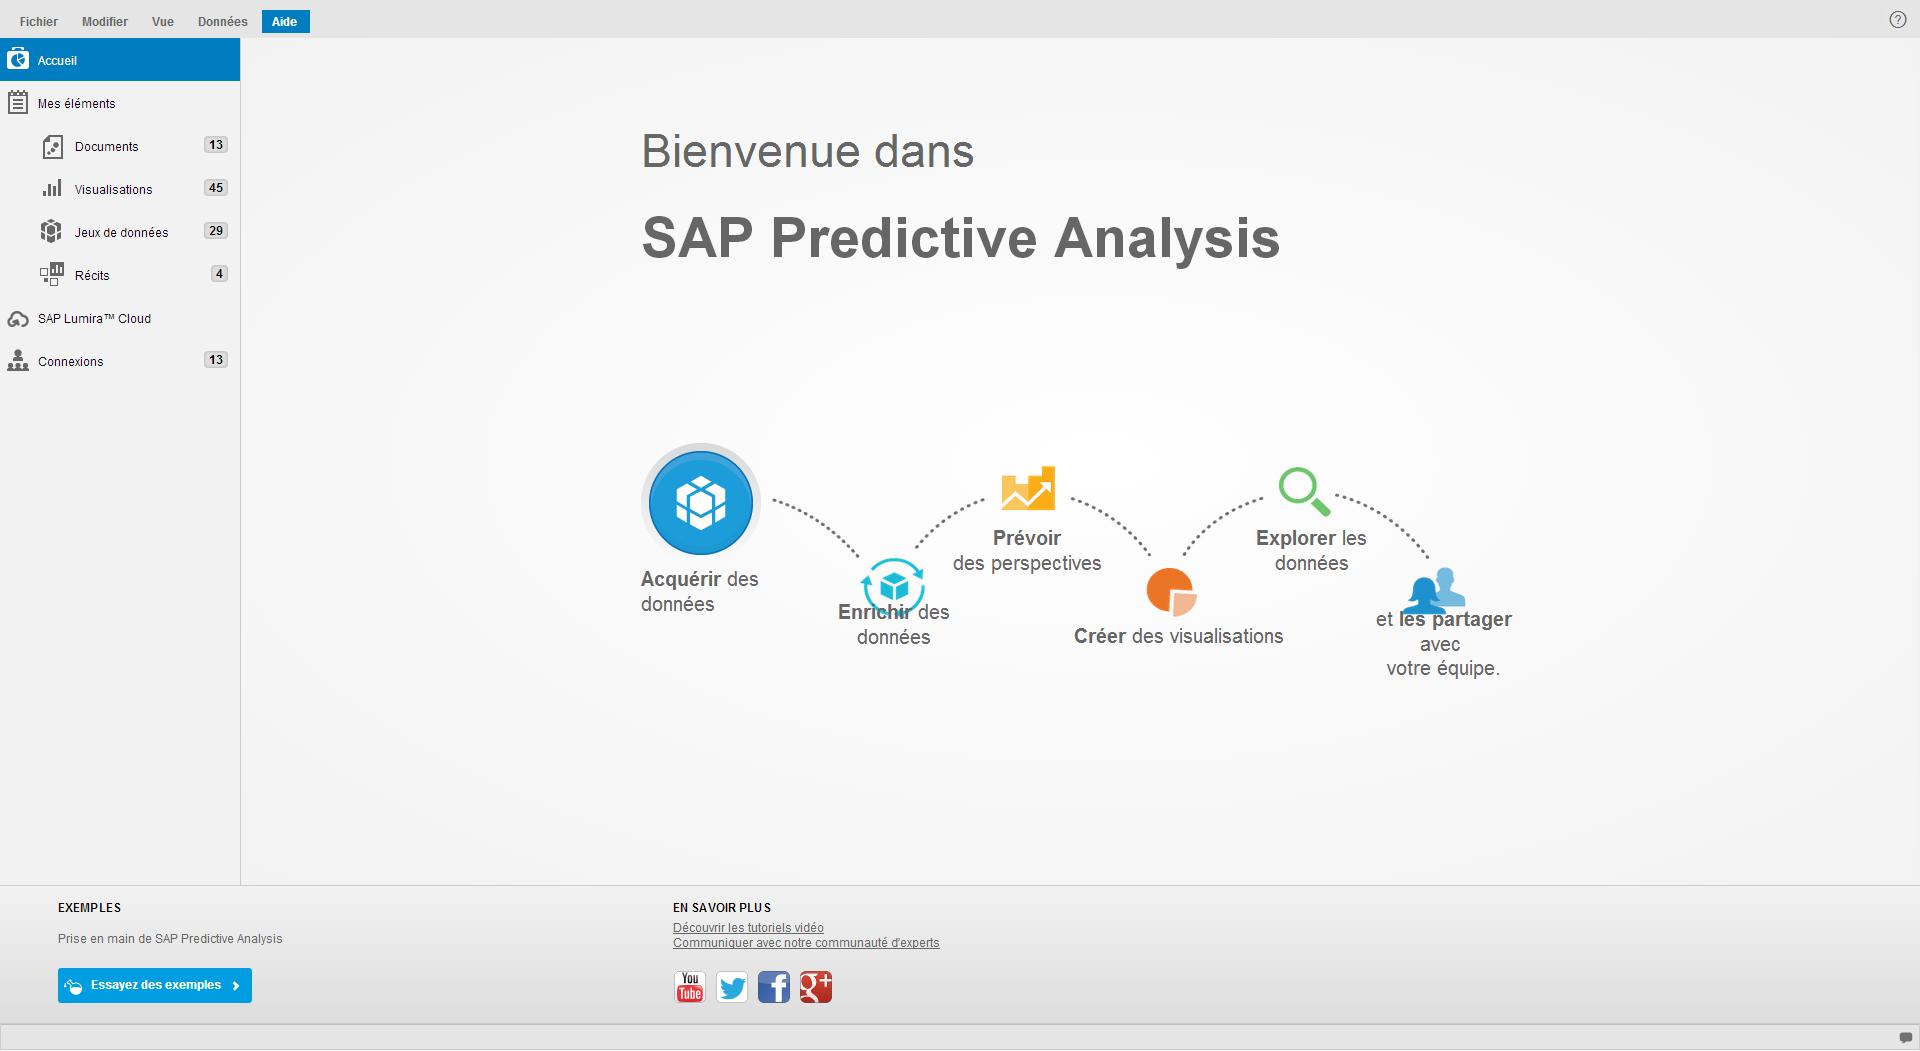 SAP Predictive Analysis - Intégrer un fichier CSV 1